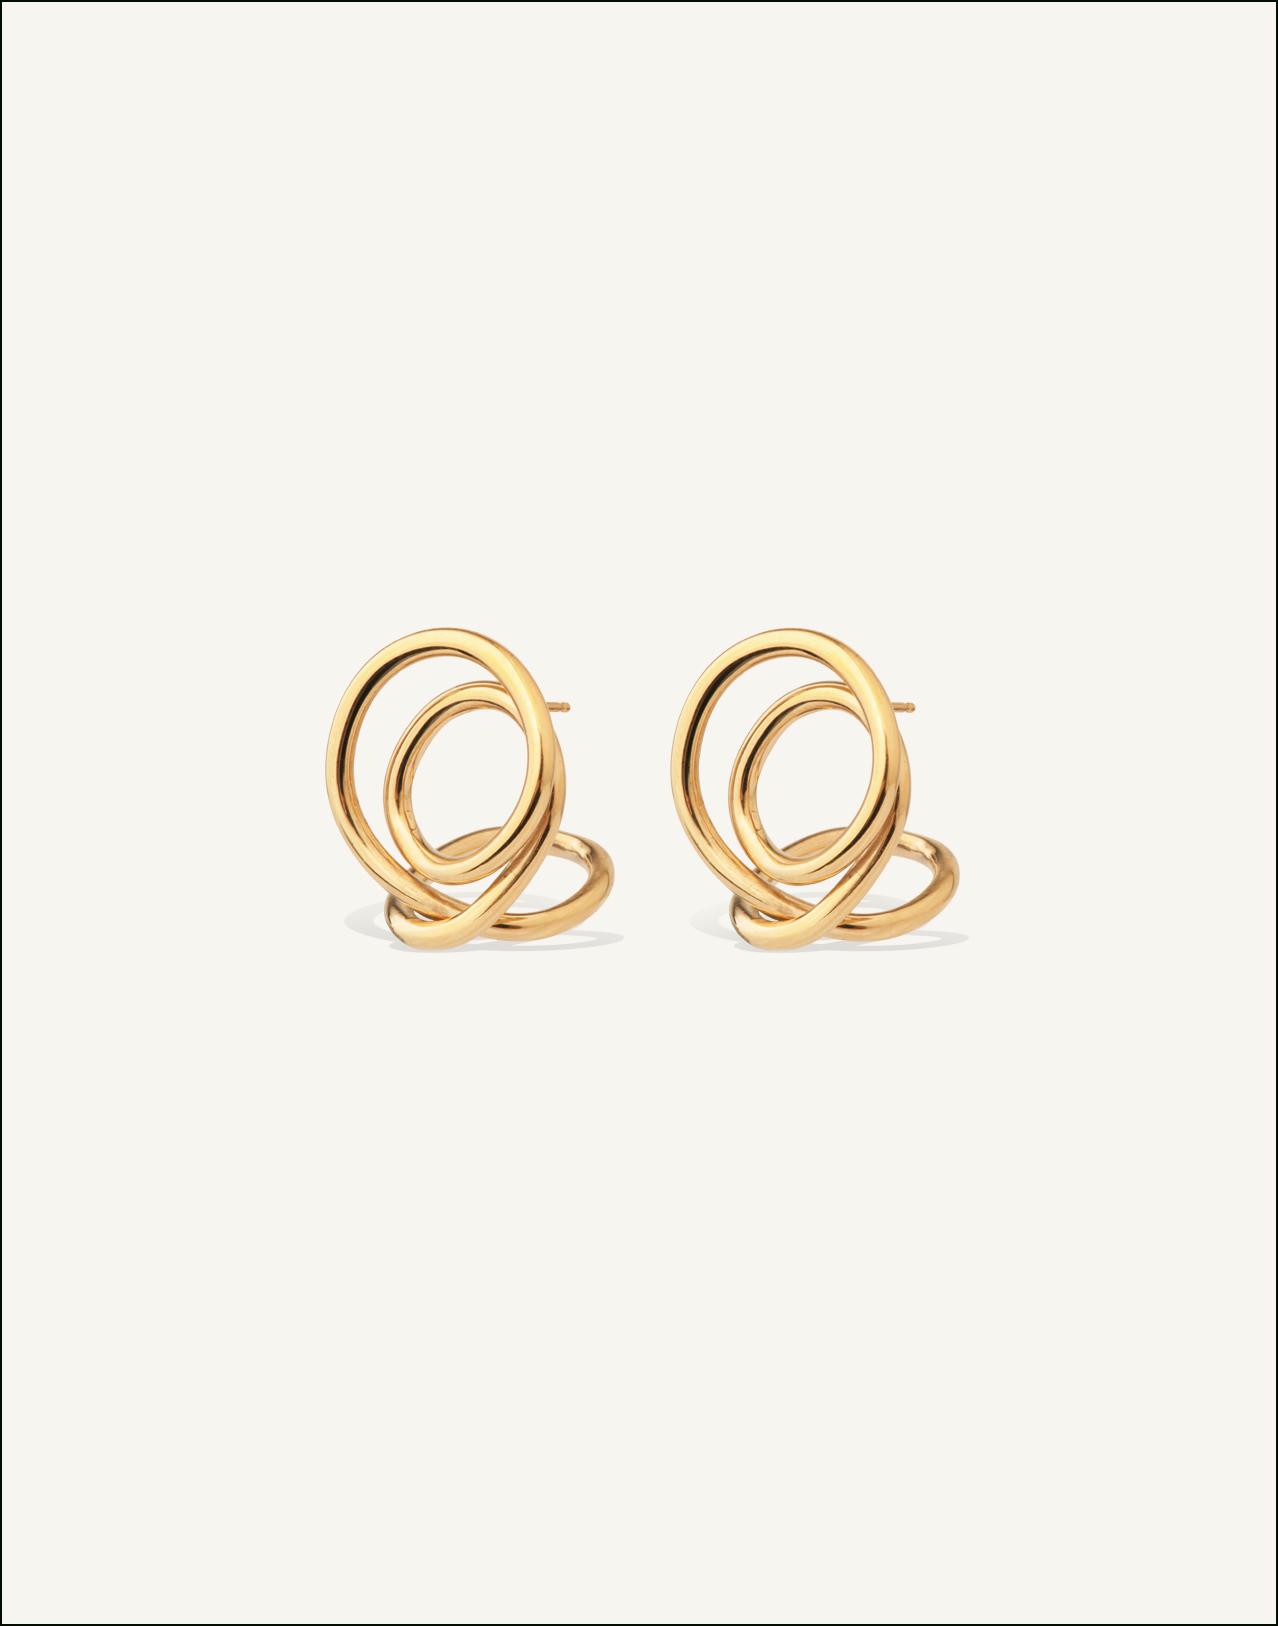 Completedworks-Earrings-The-Philosopher-3-1.jpg